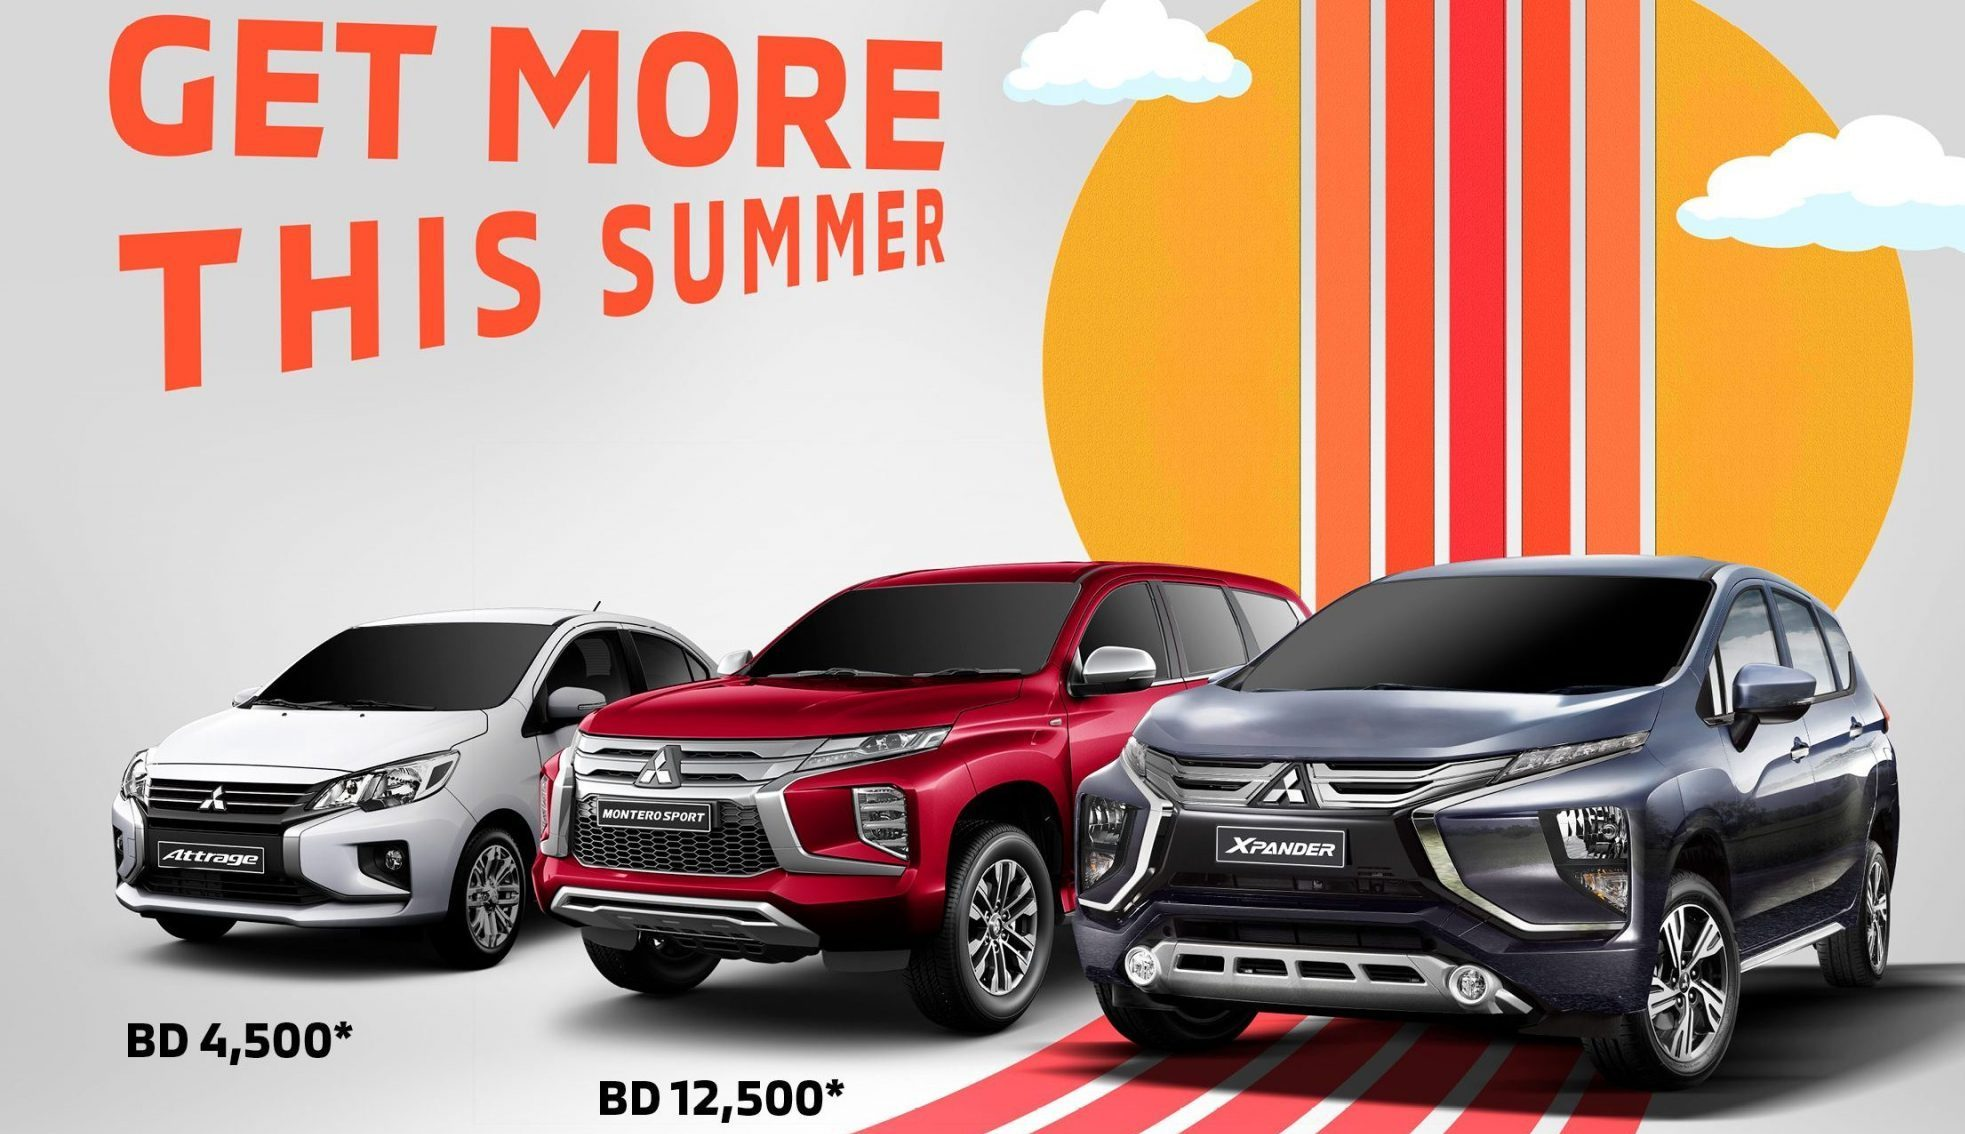 Enjoy Exclusivity with 'Mitsubishi' Summer Offers from 'Zayani Motors'